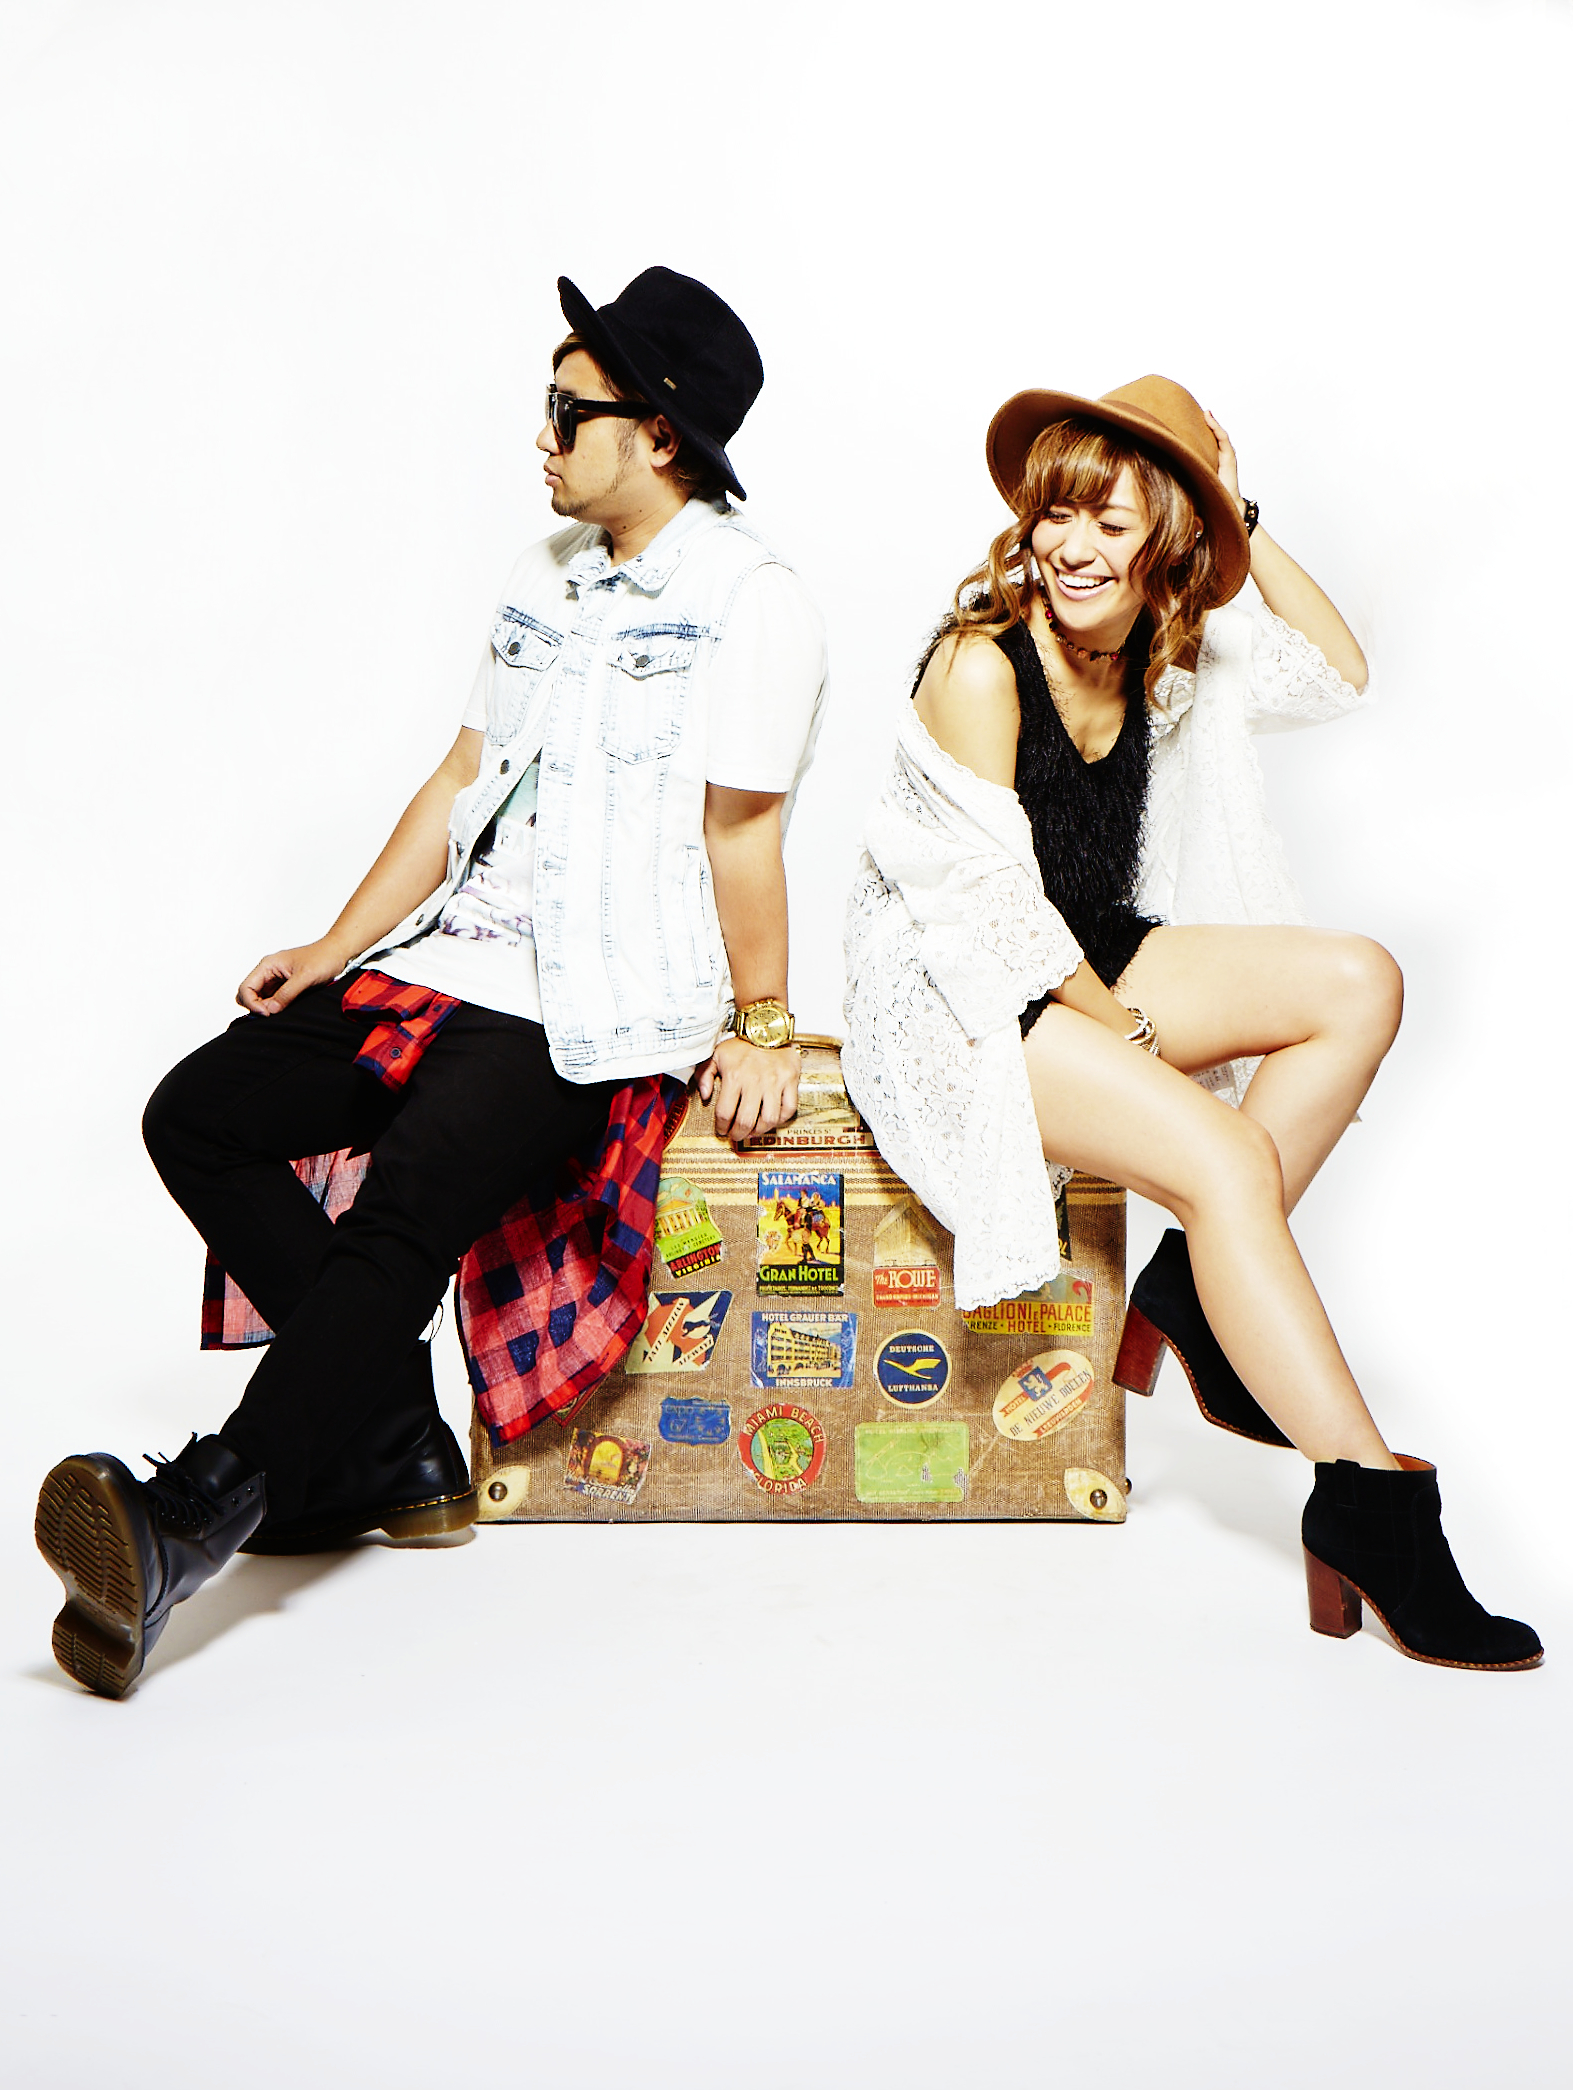 MAY'S 3月にミニアルバム『Loving』を発売、2月にはスペシャルライブも実施!サムネイル画像